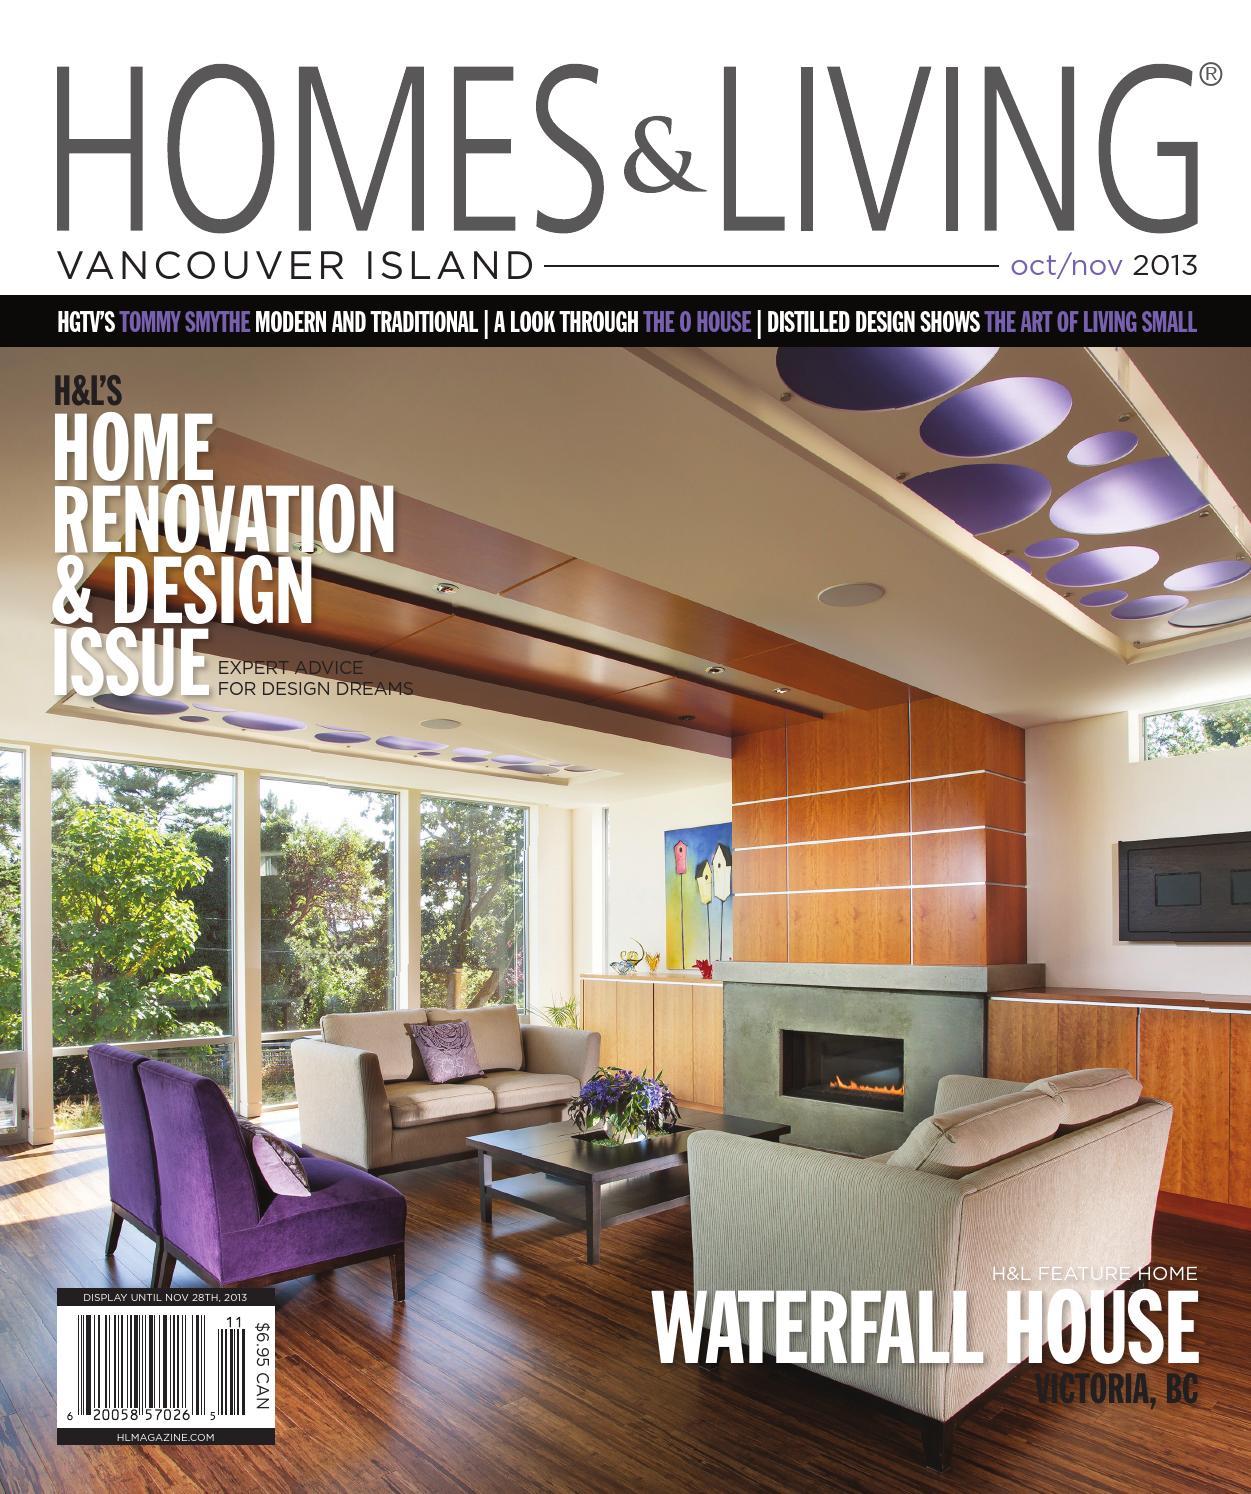 ISSUU - Homes & Living Vancouver Island Oct/Nov 2013 issue